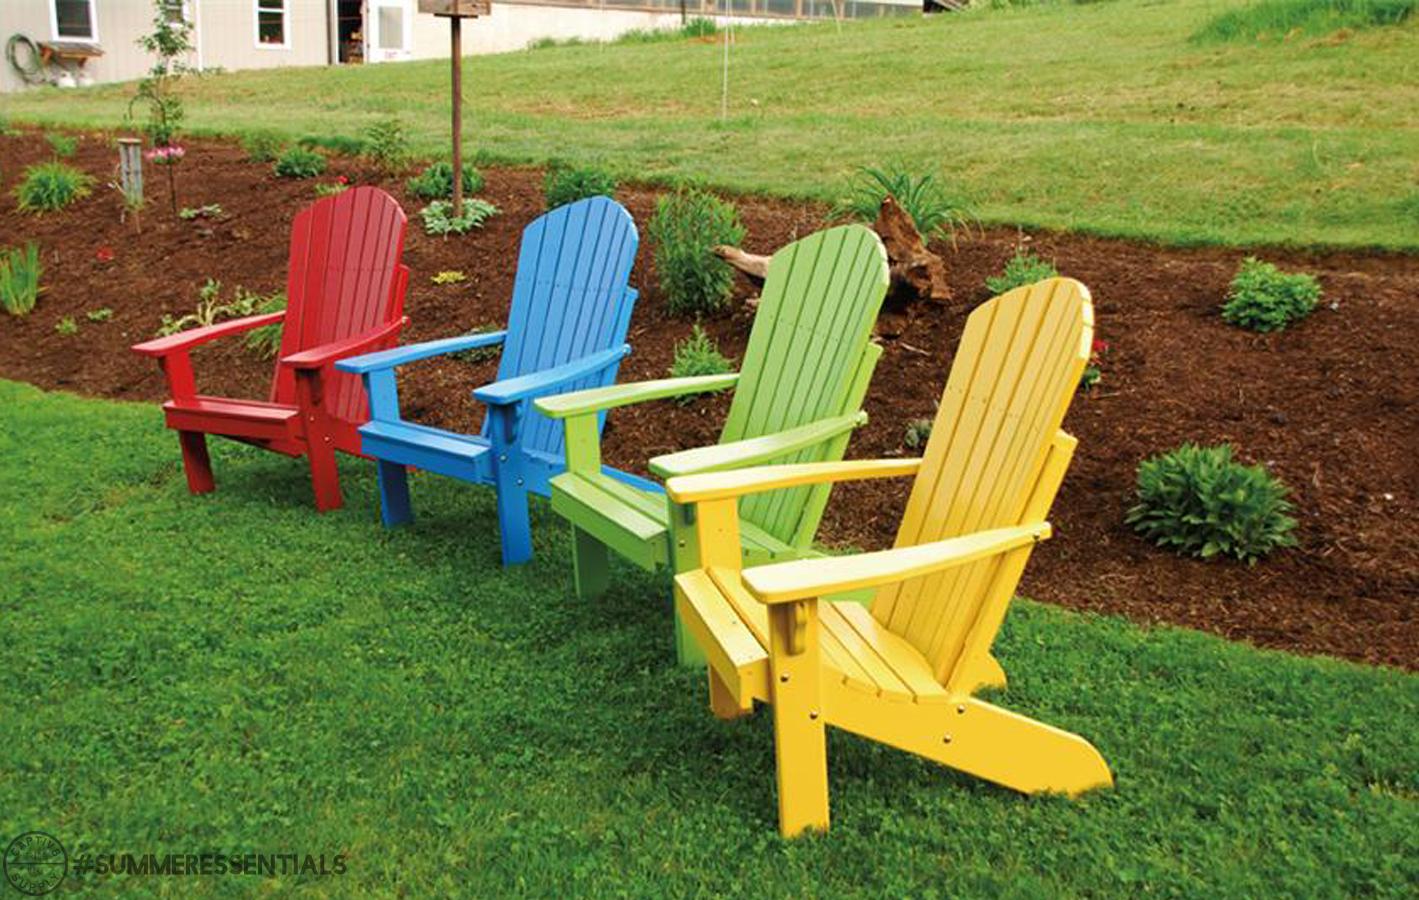 Summeressentials Custom Adirondack Chairs Captiv8